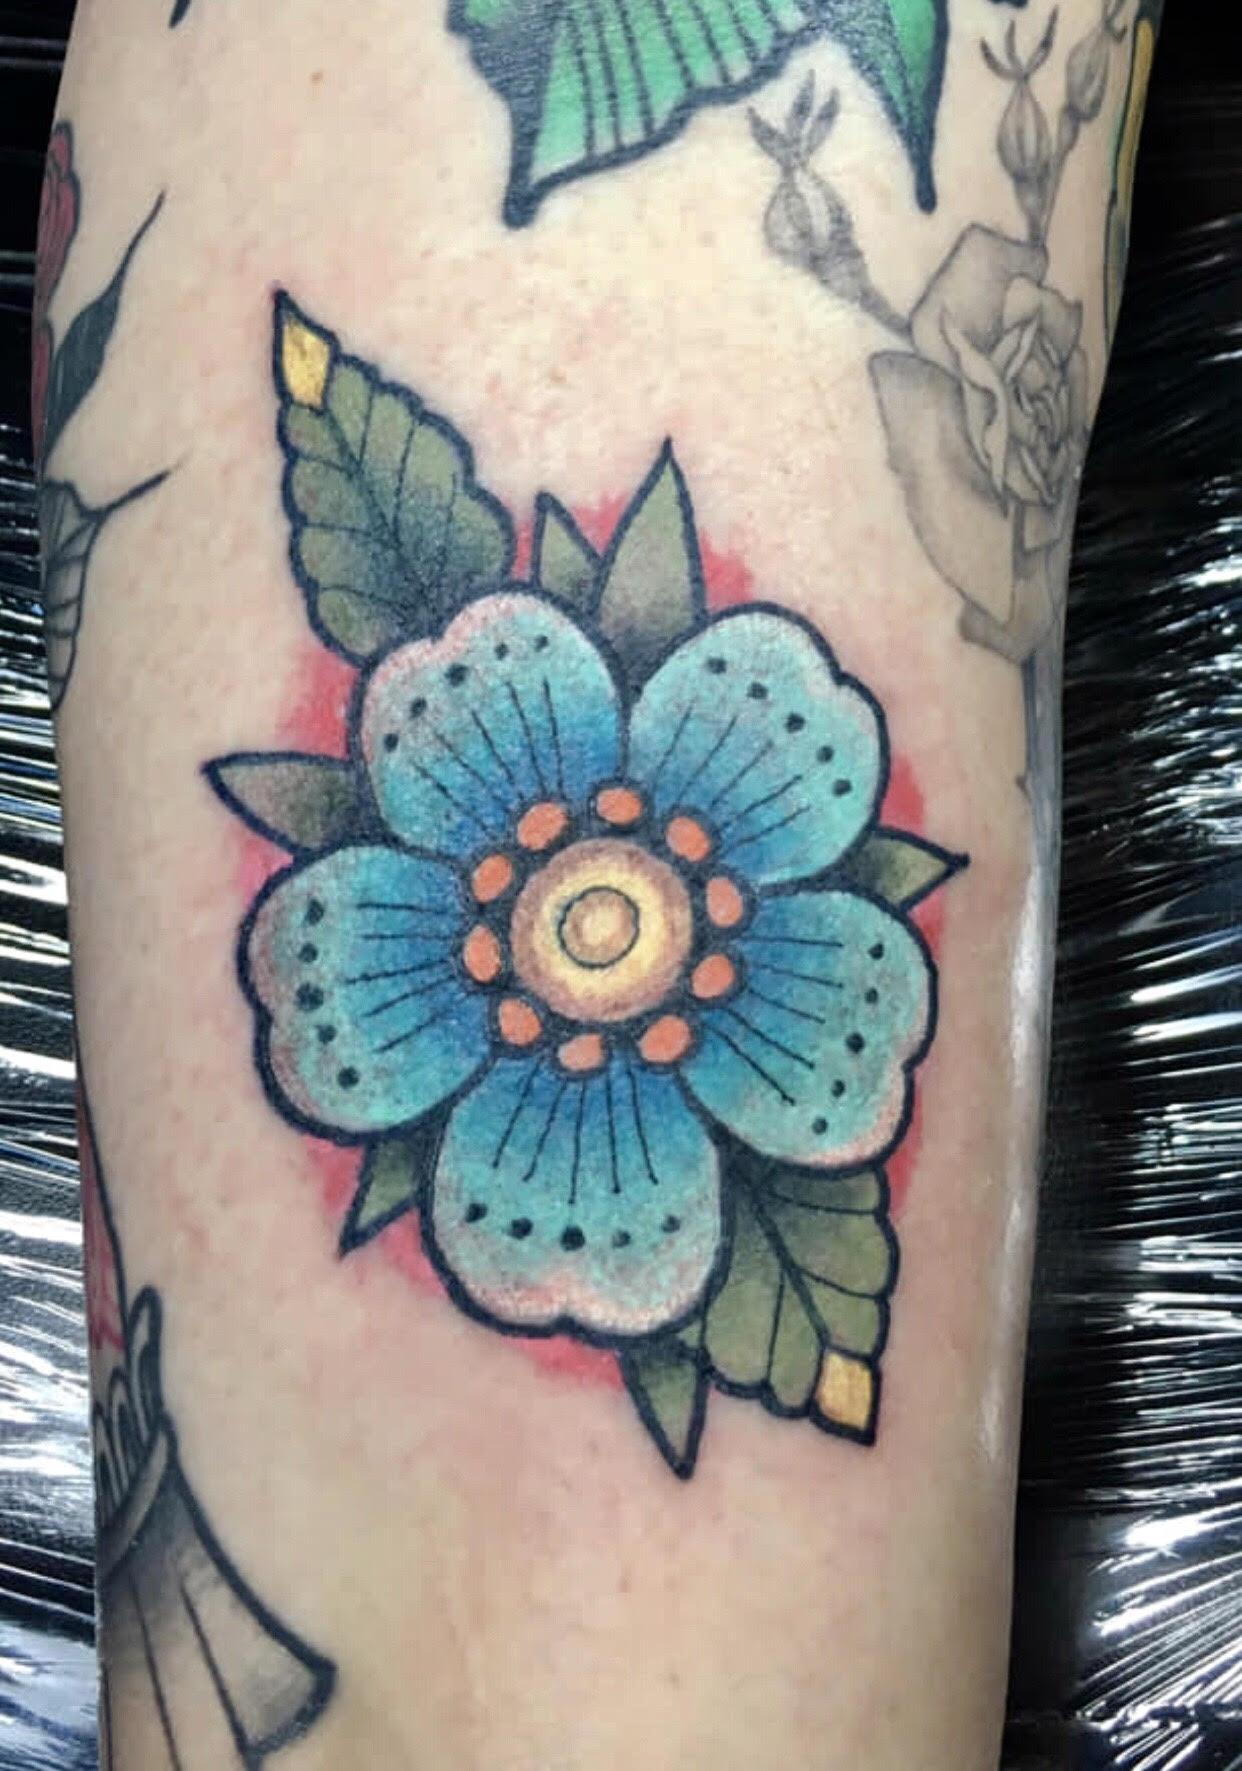 Traditional Flower Tattoo by Krystof